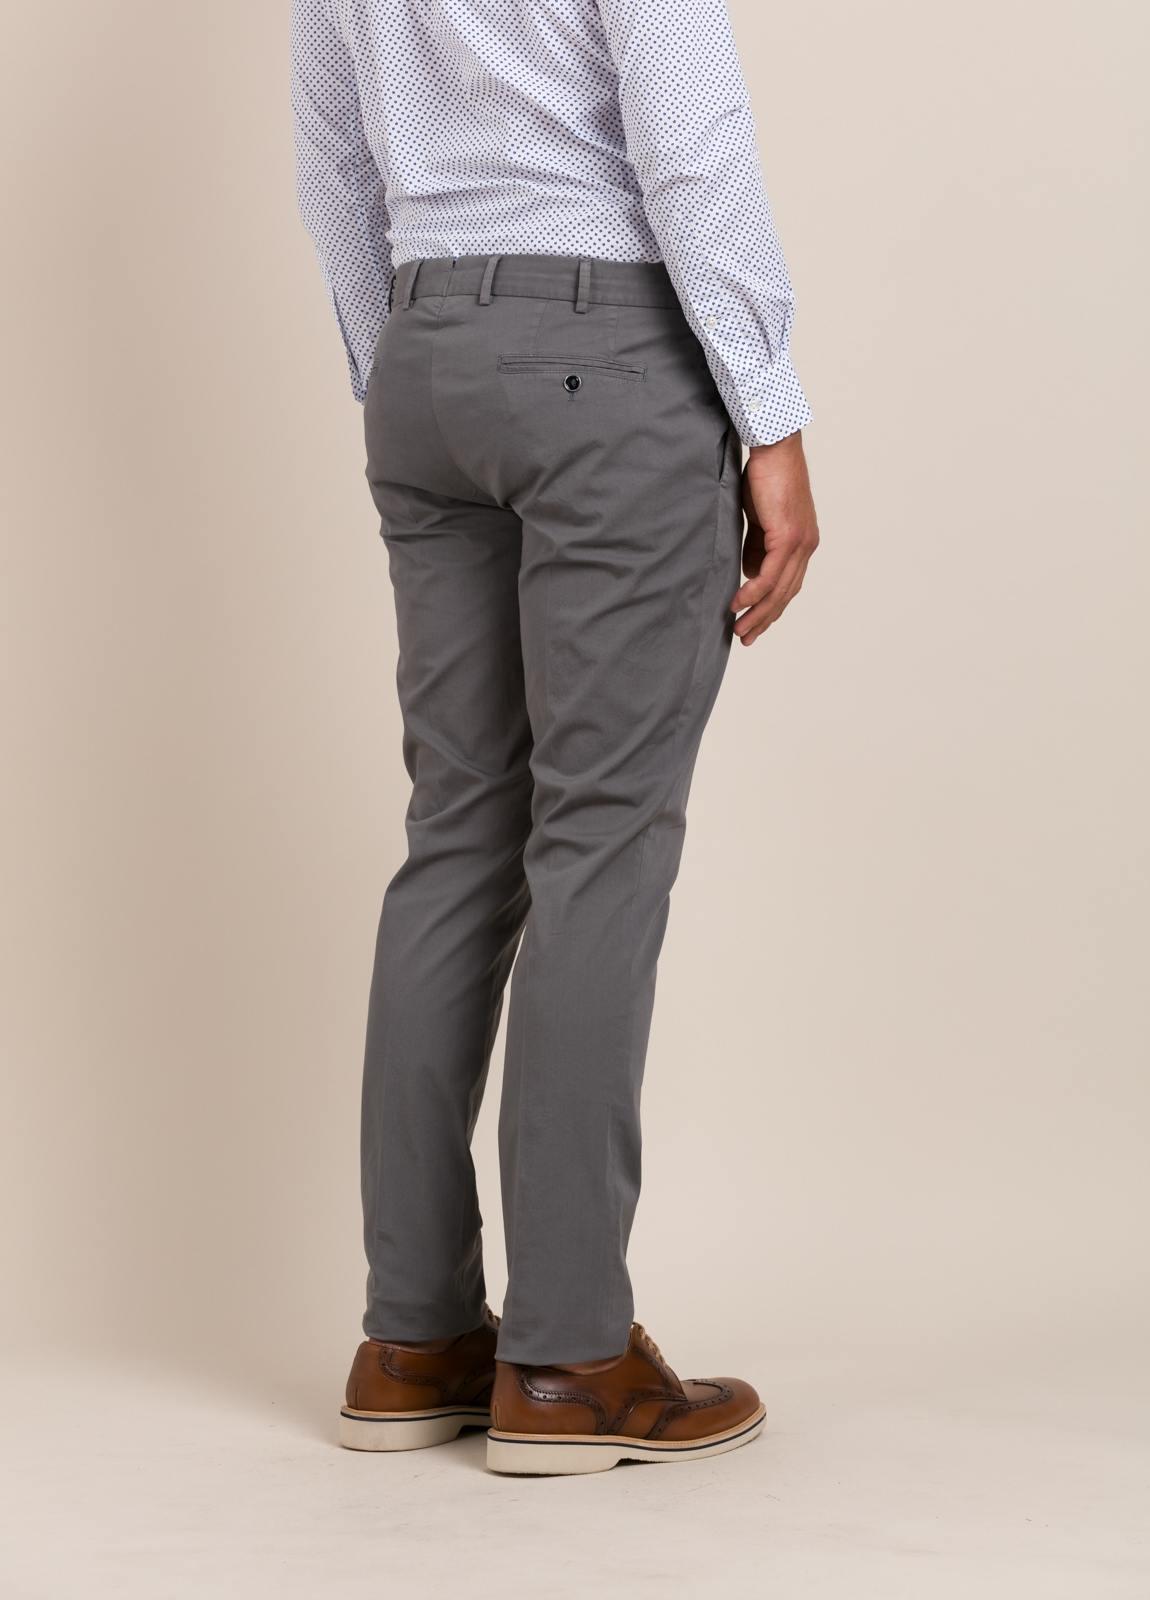 Pantalón chino FUREST COLECCIÓN Slim Fit gris - Ítem3